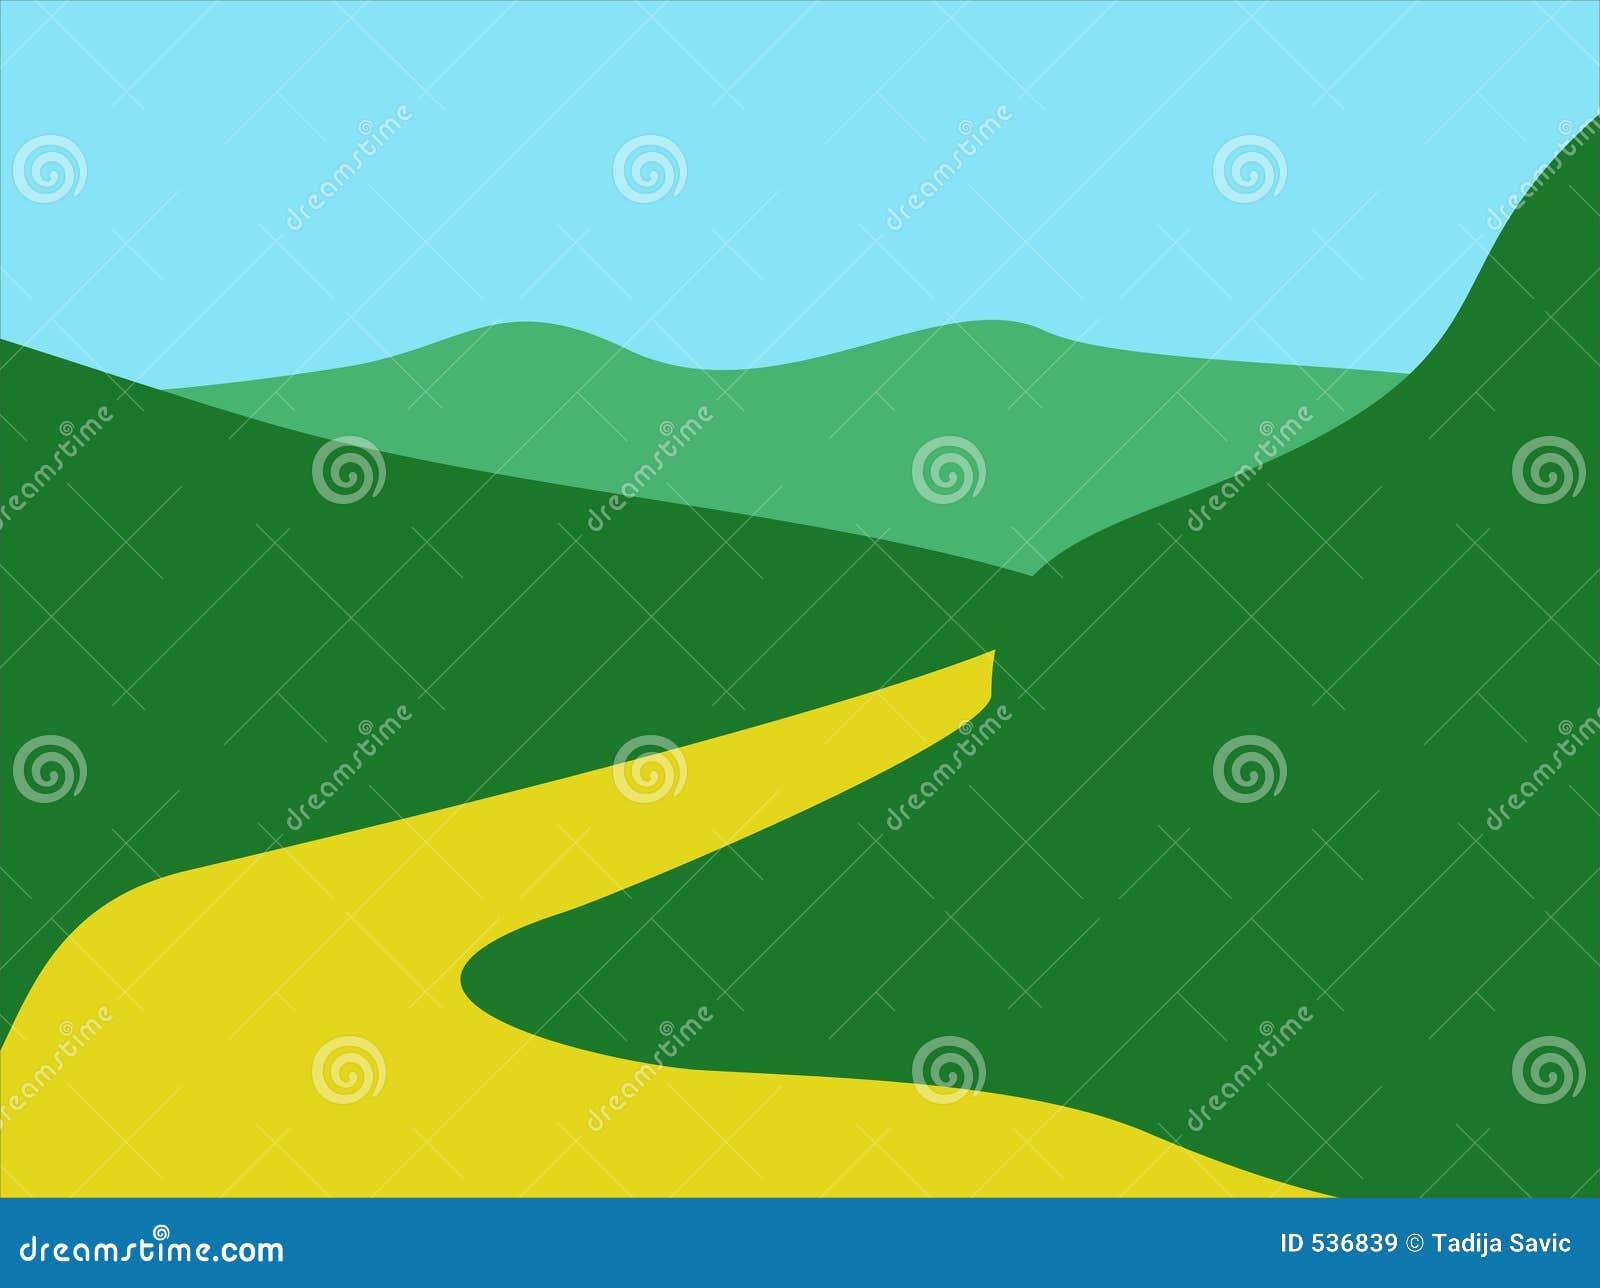 Download 404横向 库存例证. 插画 包括有 图画, 草本, 横向, 例证, 植物群, 凹道, 晒裂, 陆运, 天空 - 536839